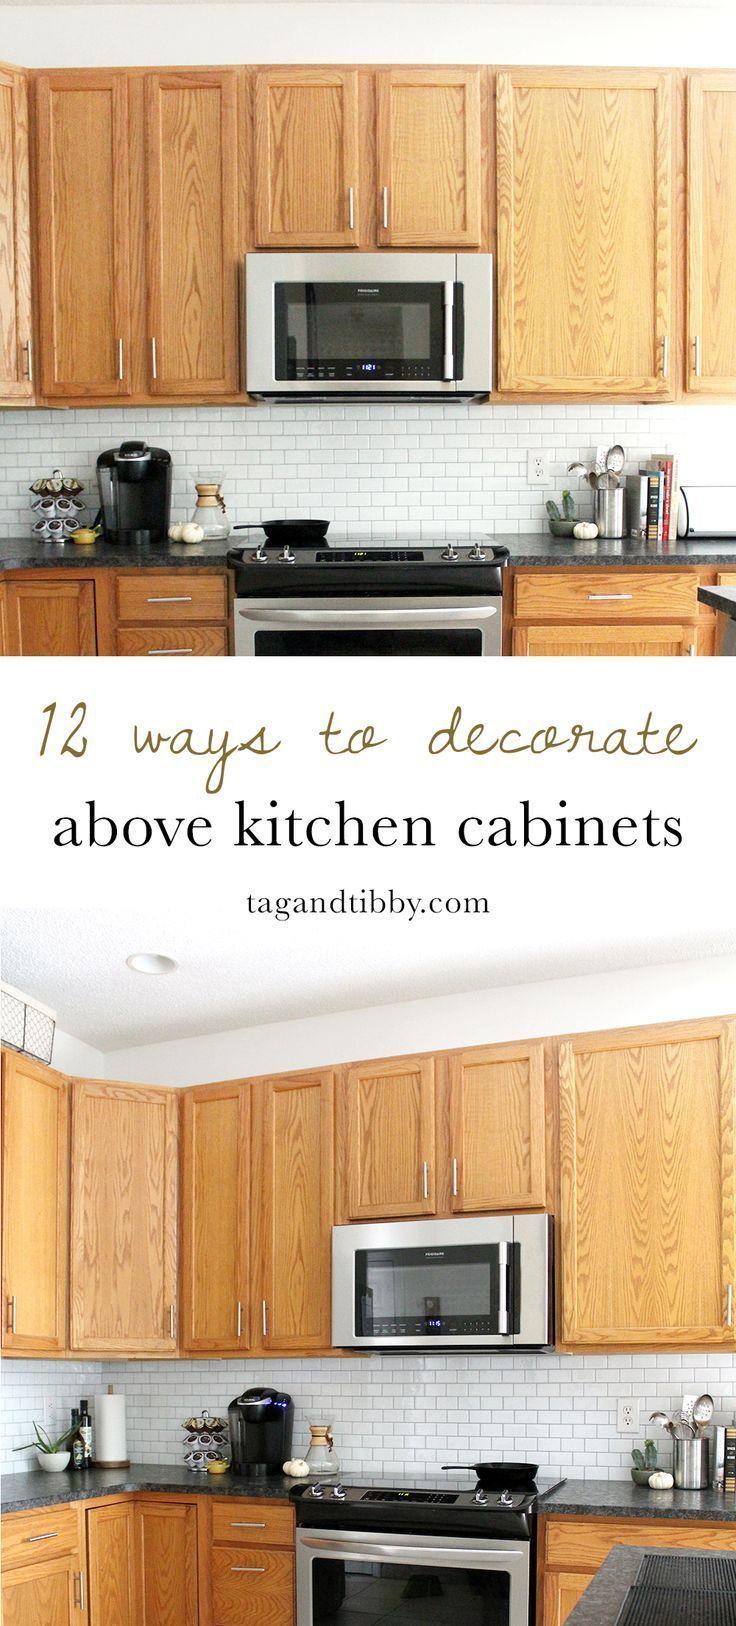 12 ways to decorate above kitchen cabinets  above kitchen